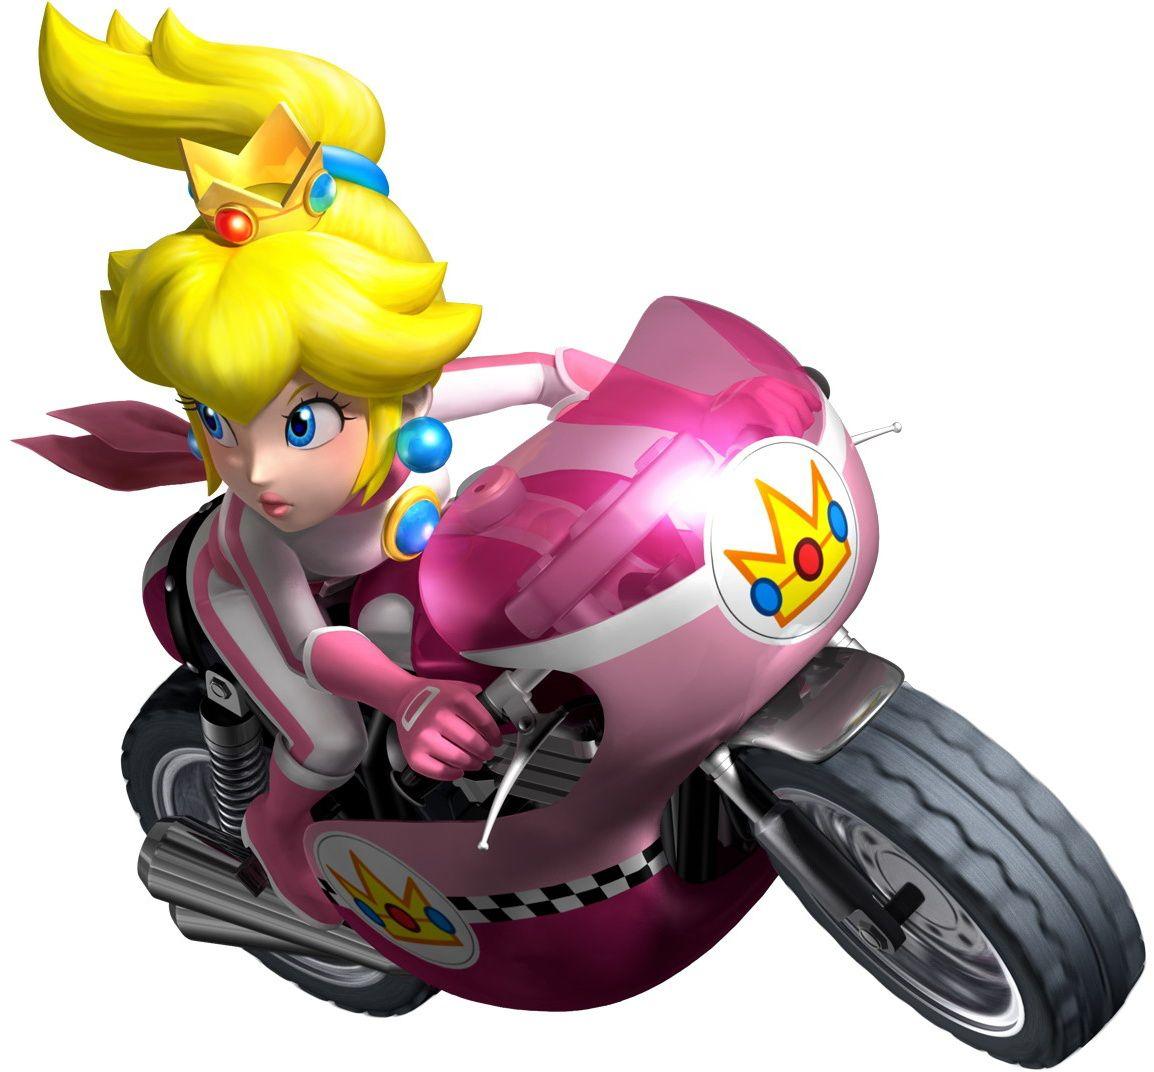 Peach En Moto Princess Peach Daisy And Rosalina Súper Mário